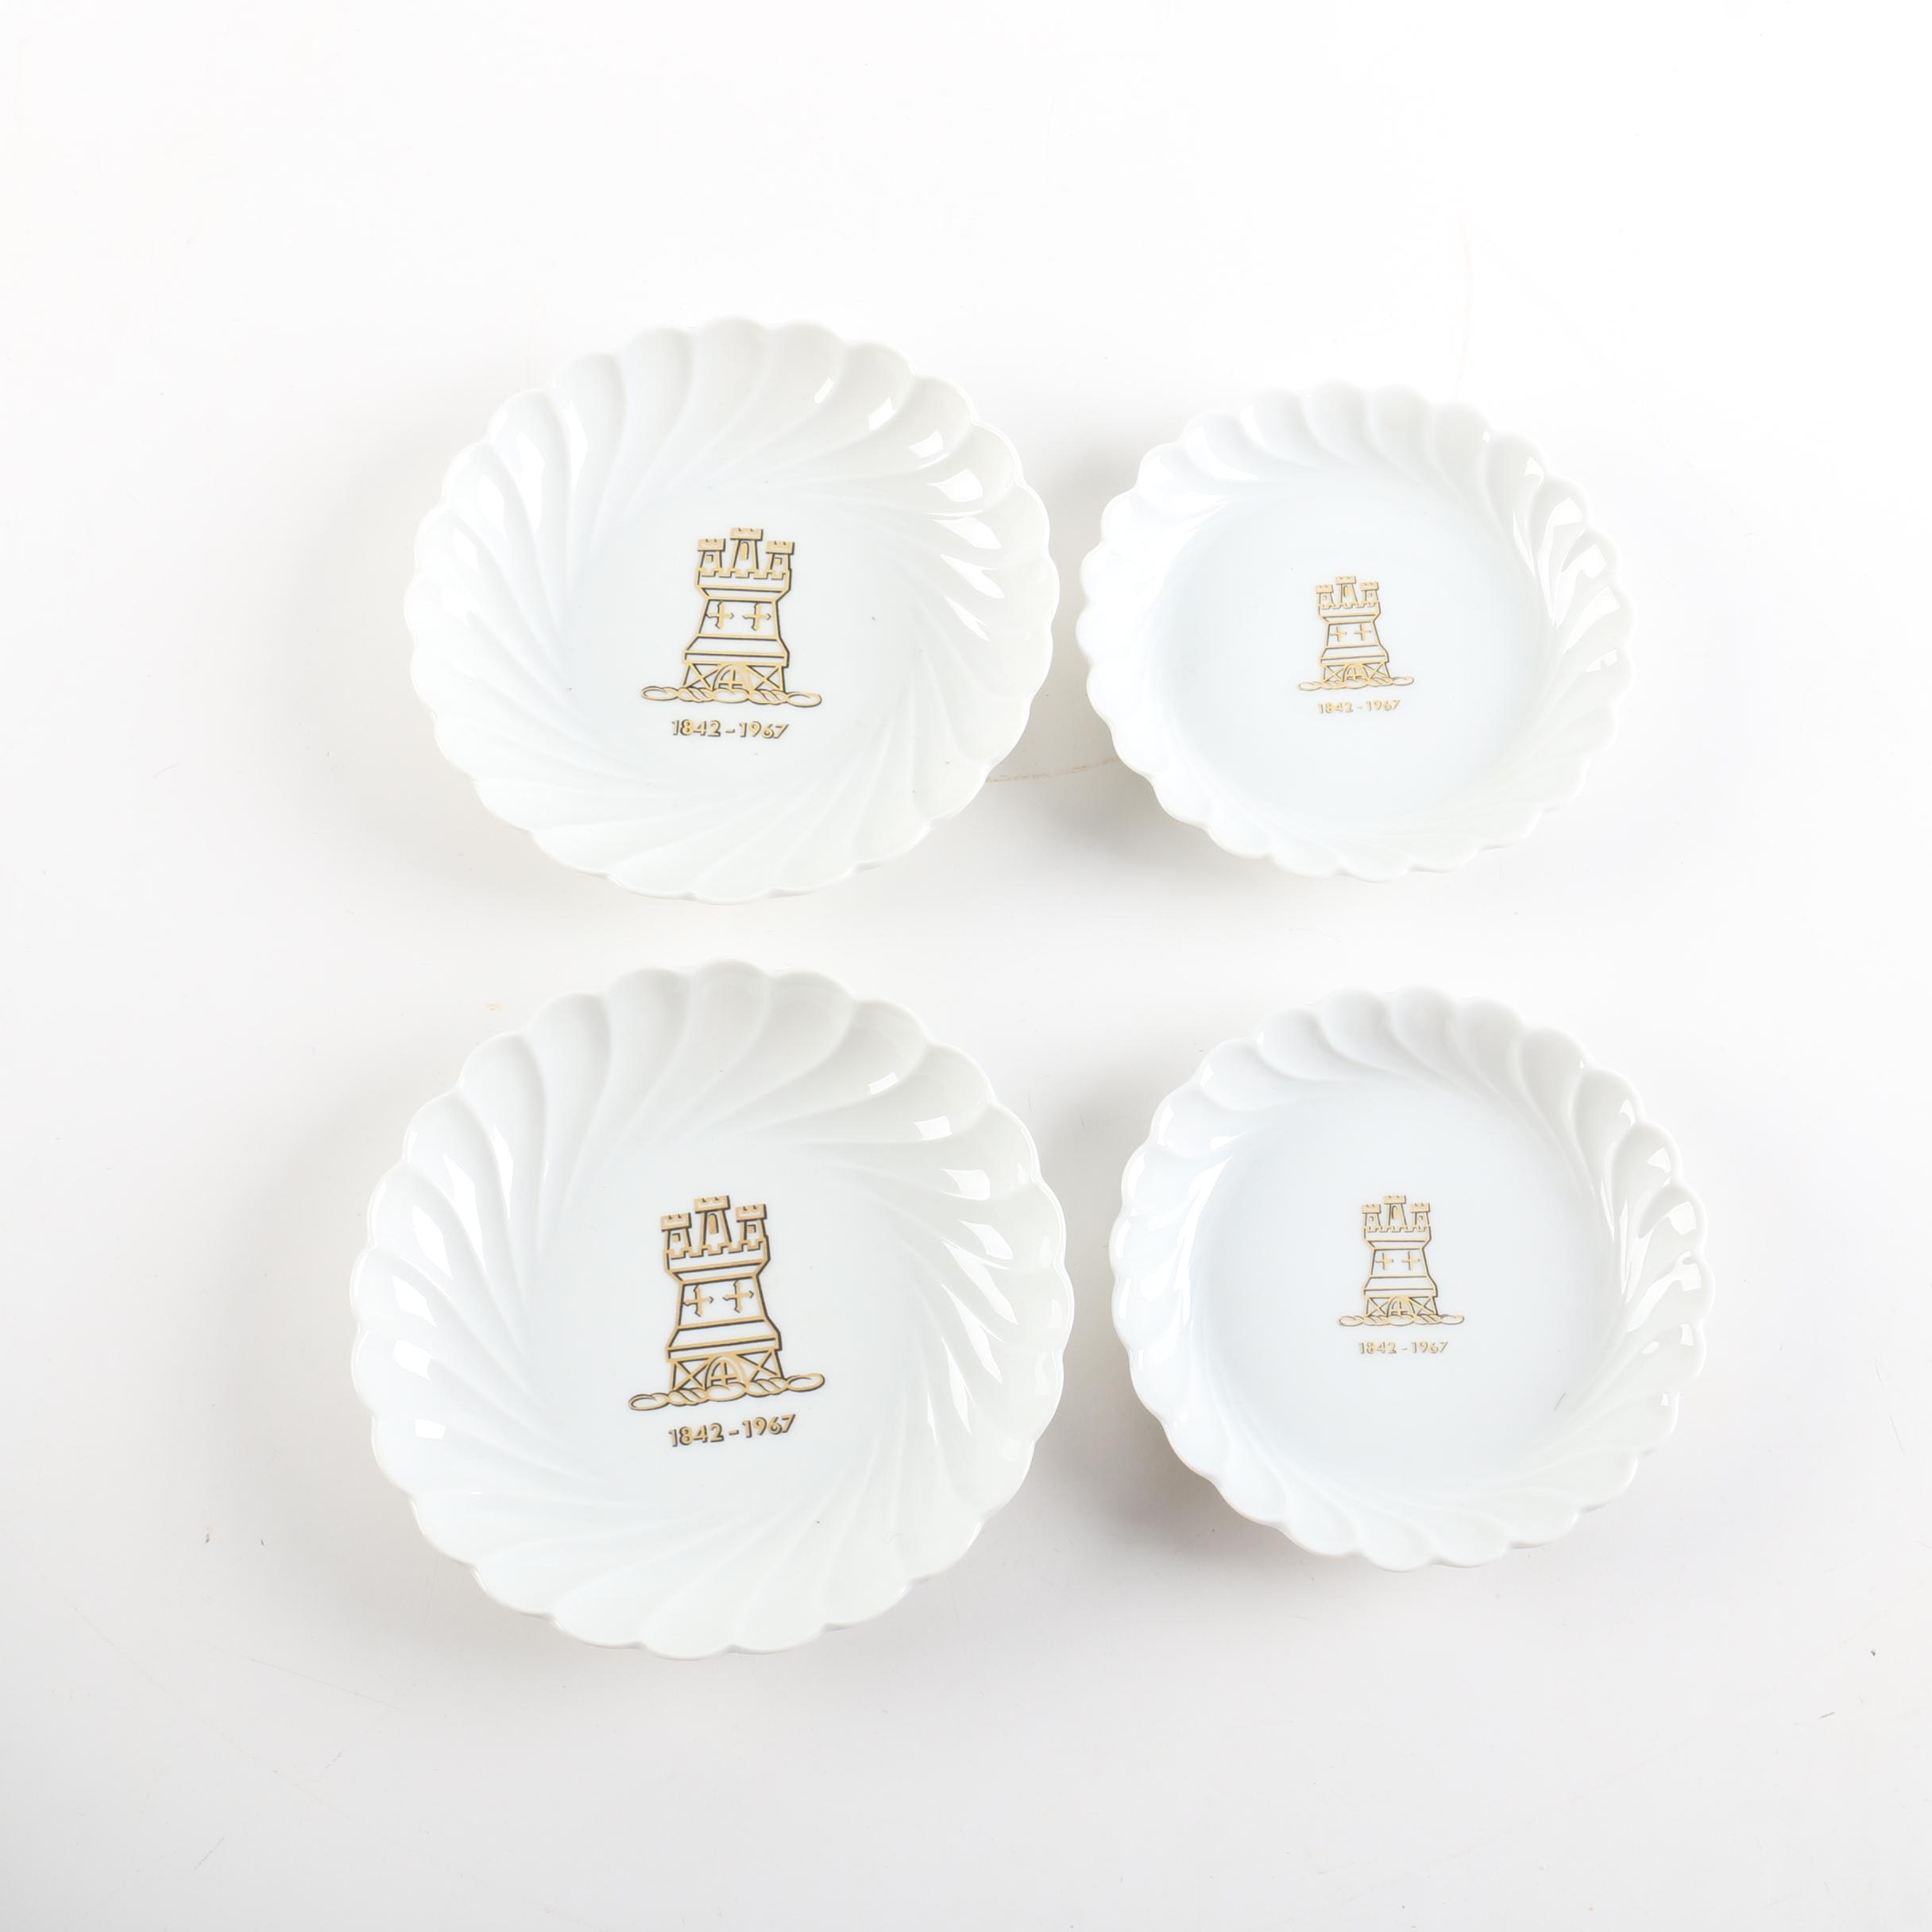 Limoges Haviland Anniversary Plates